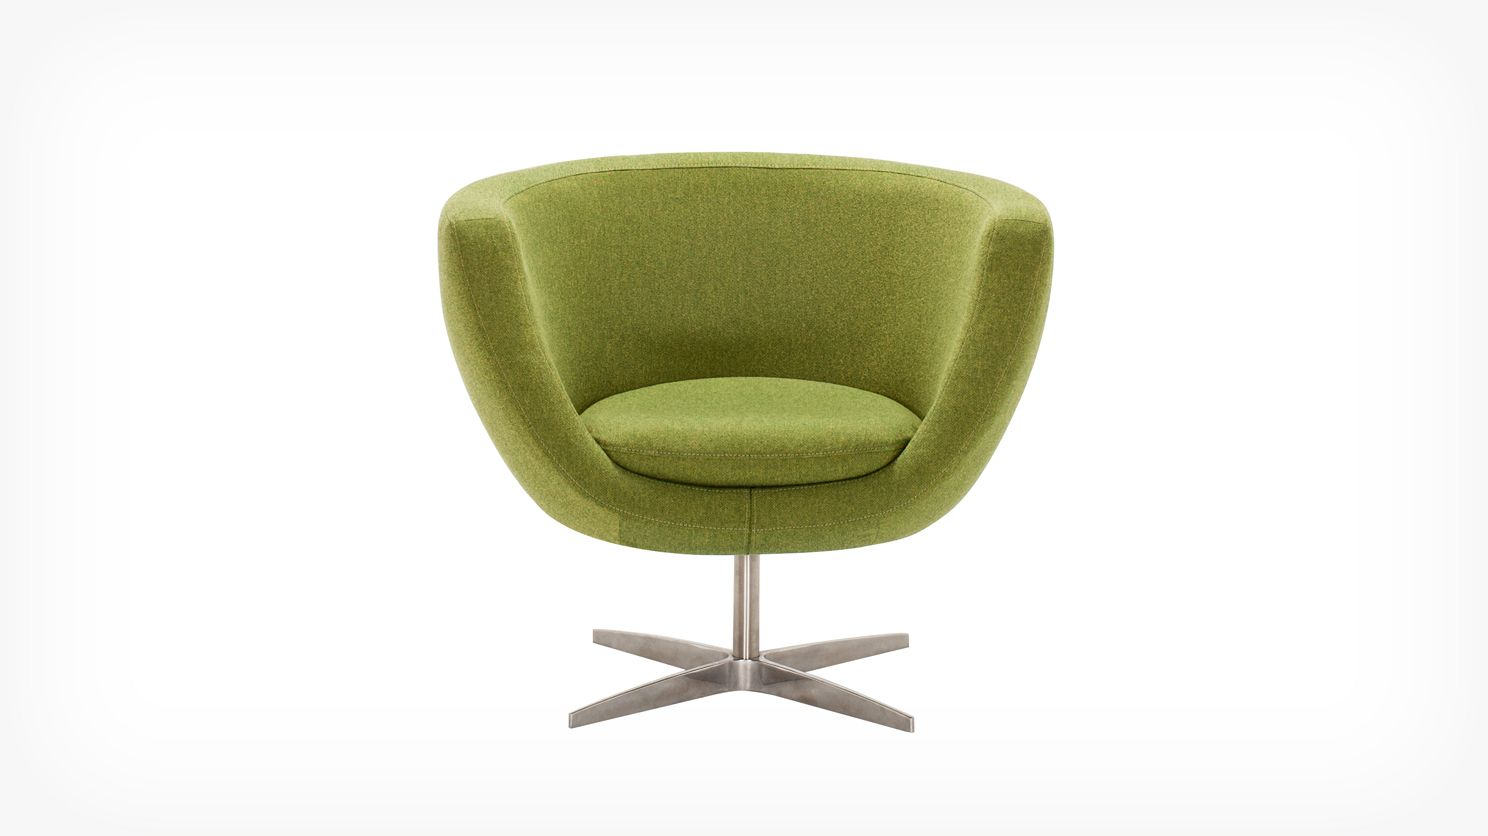 Fabulous Eq3 Swivel Tub Chair Fabric From 699 Less 15 I Have Creativecarmelina Interior Chair Design Creativecarmelinacom